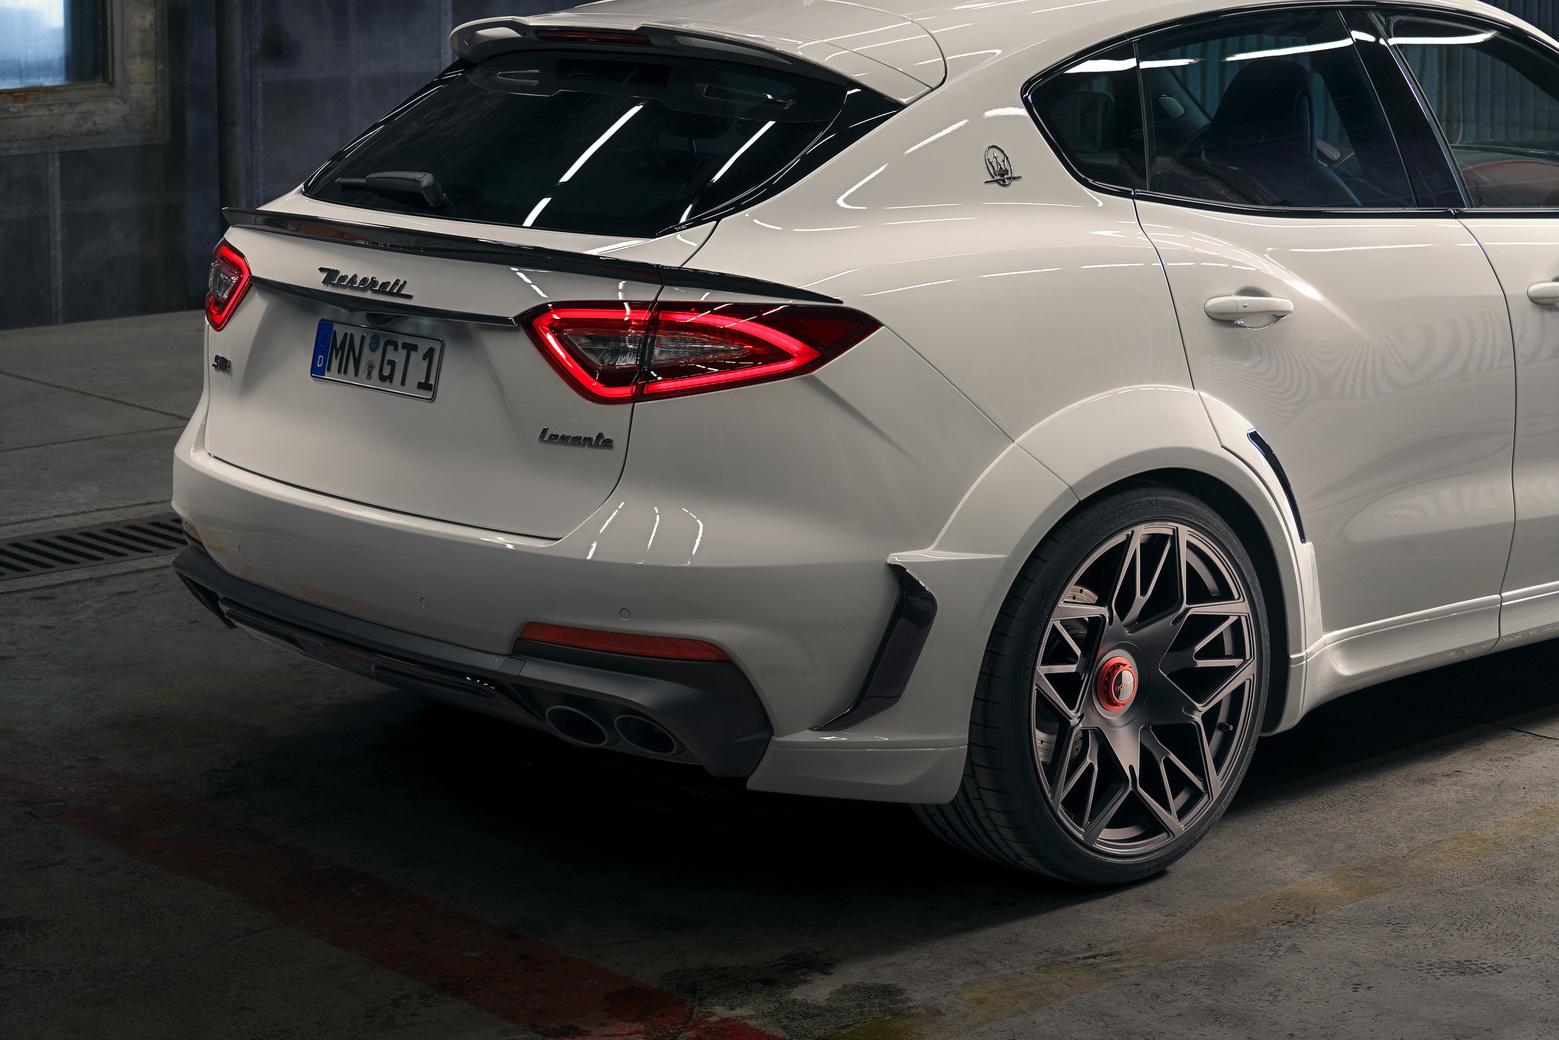 Maserati-Levante-Trofeo-by-Novitec-10